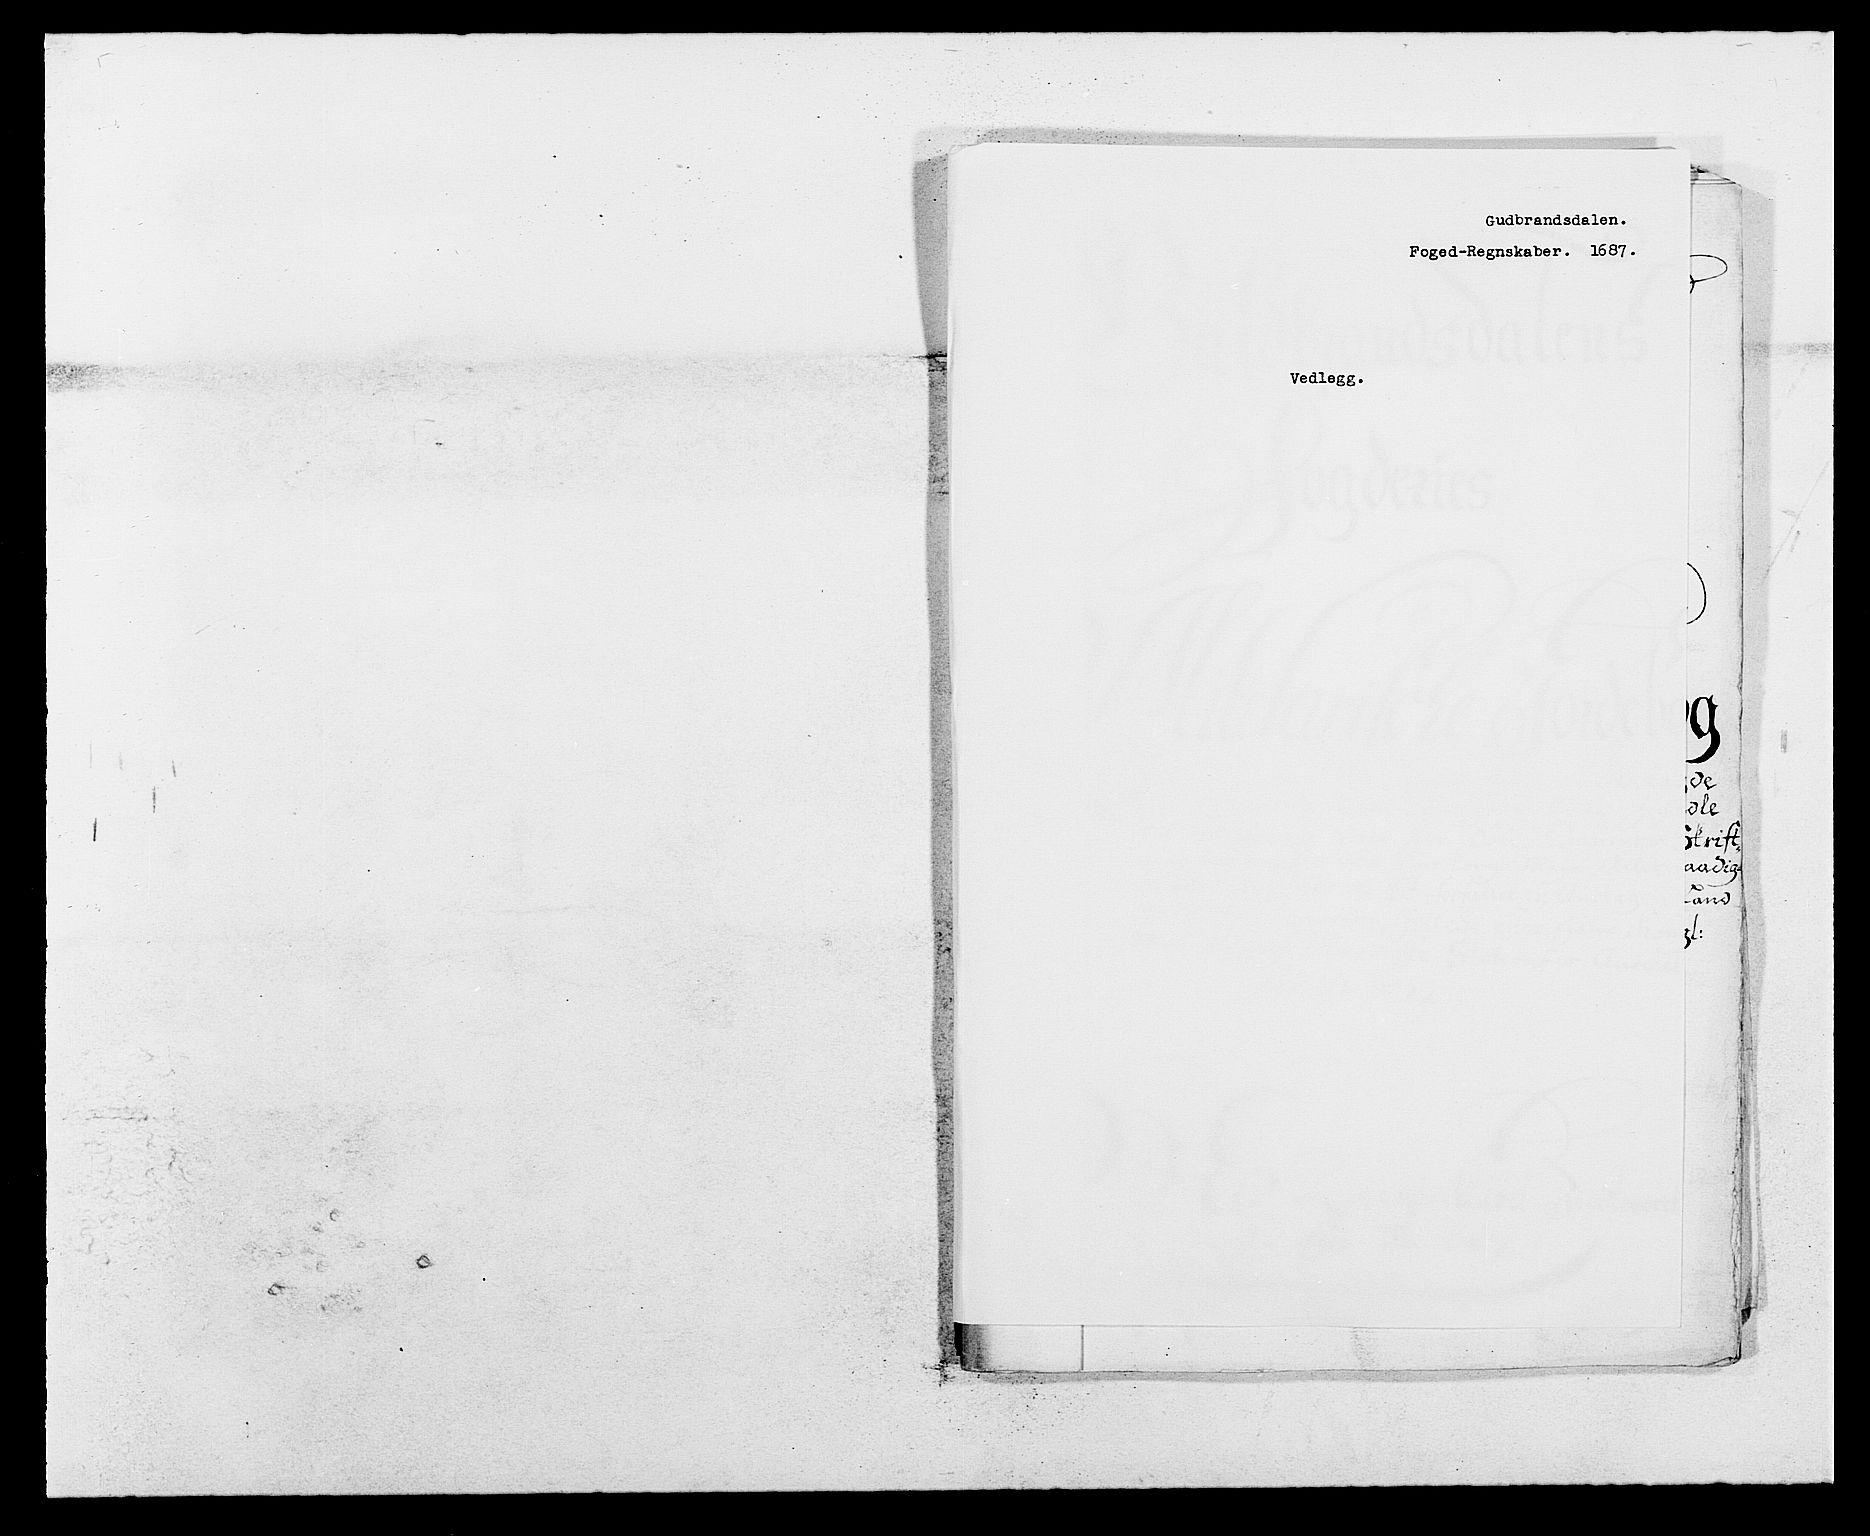 RA, Rentekammeret inntil 1814, Reviderte regnskaper, Fogderegnskap, R17/L1162: Fogderegnskap Gudbrandsdal, 1682-1689, s. 303